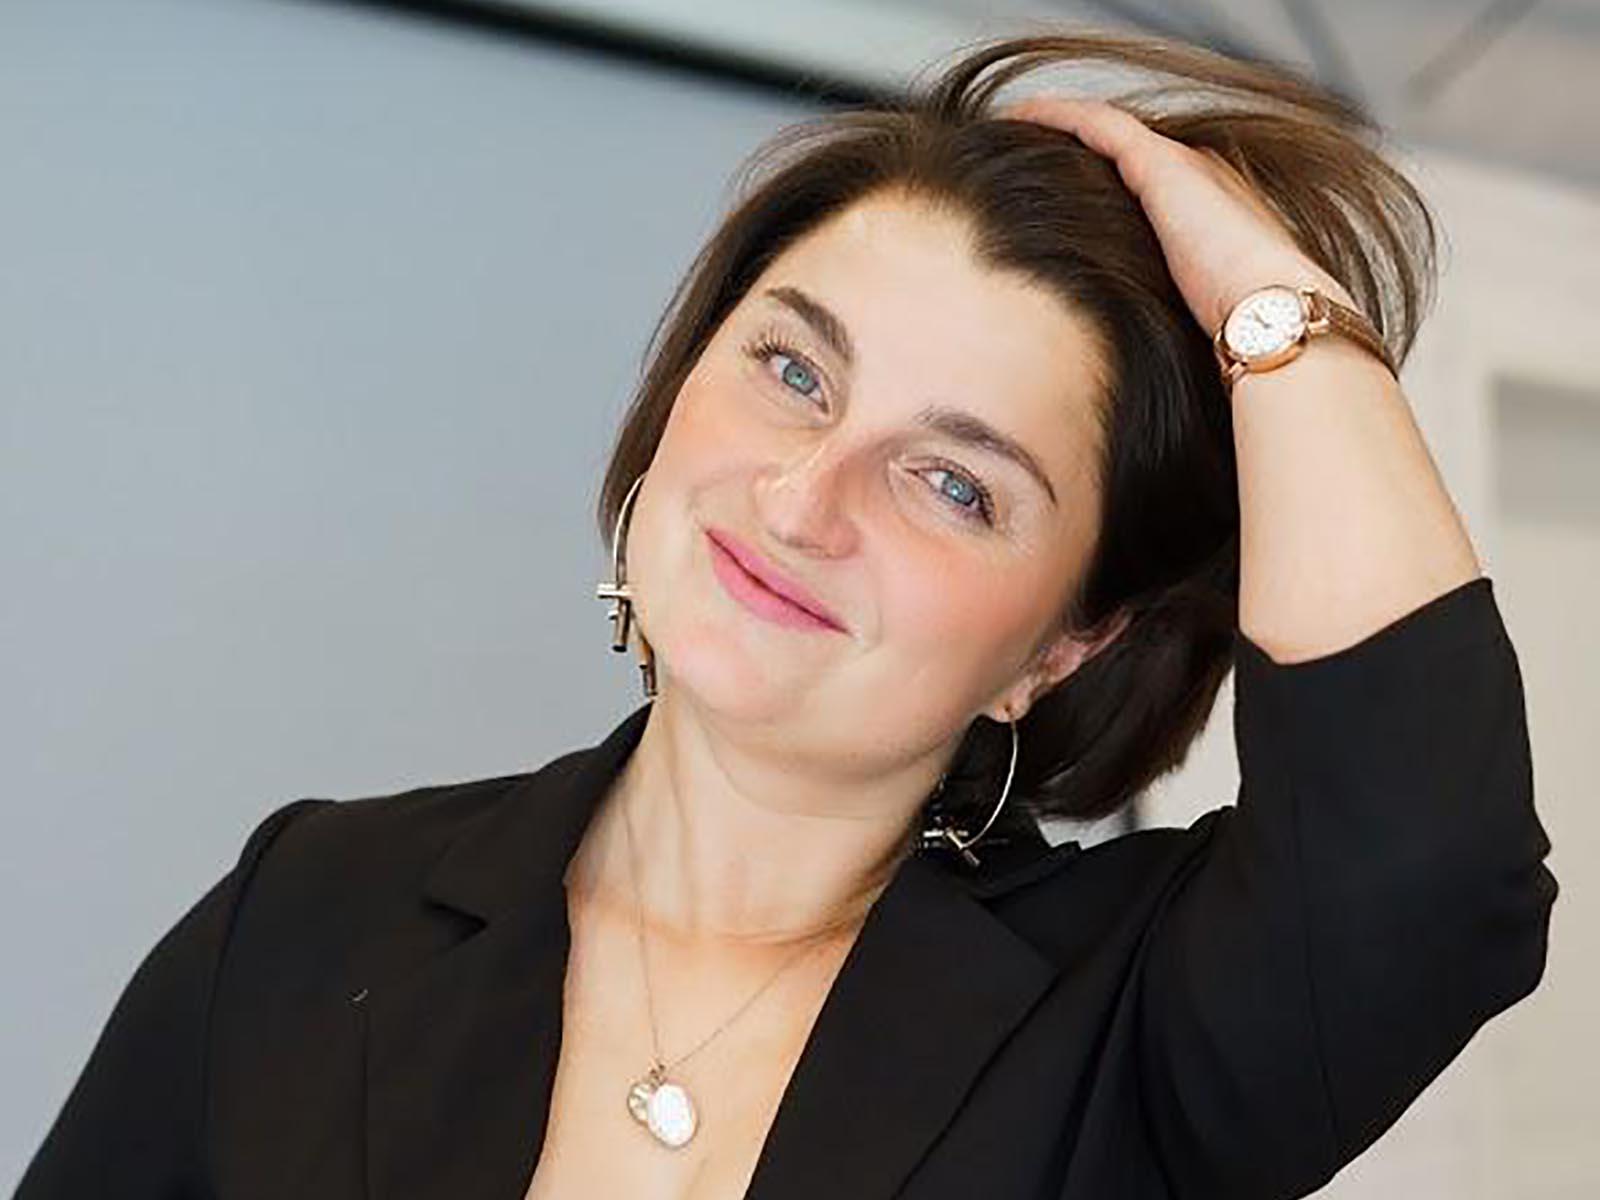 Светлана Леглик - тренер по нетворкингу